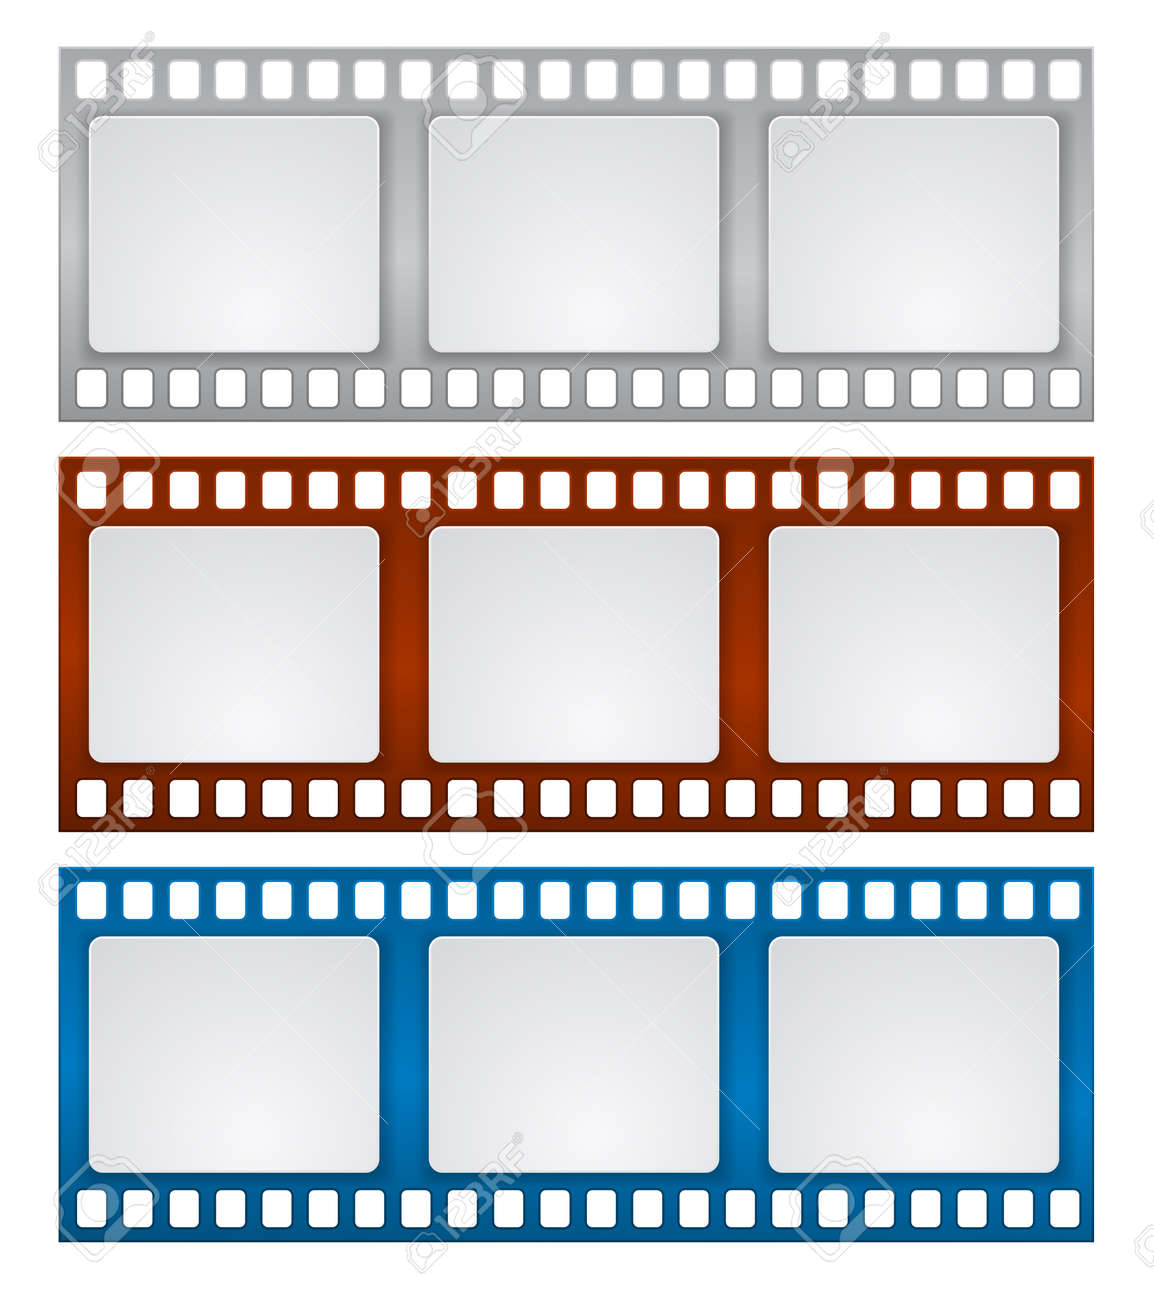 Film Strip Frame Design Background Royalty Free Cliparts, Vectors ...